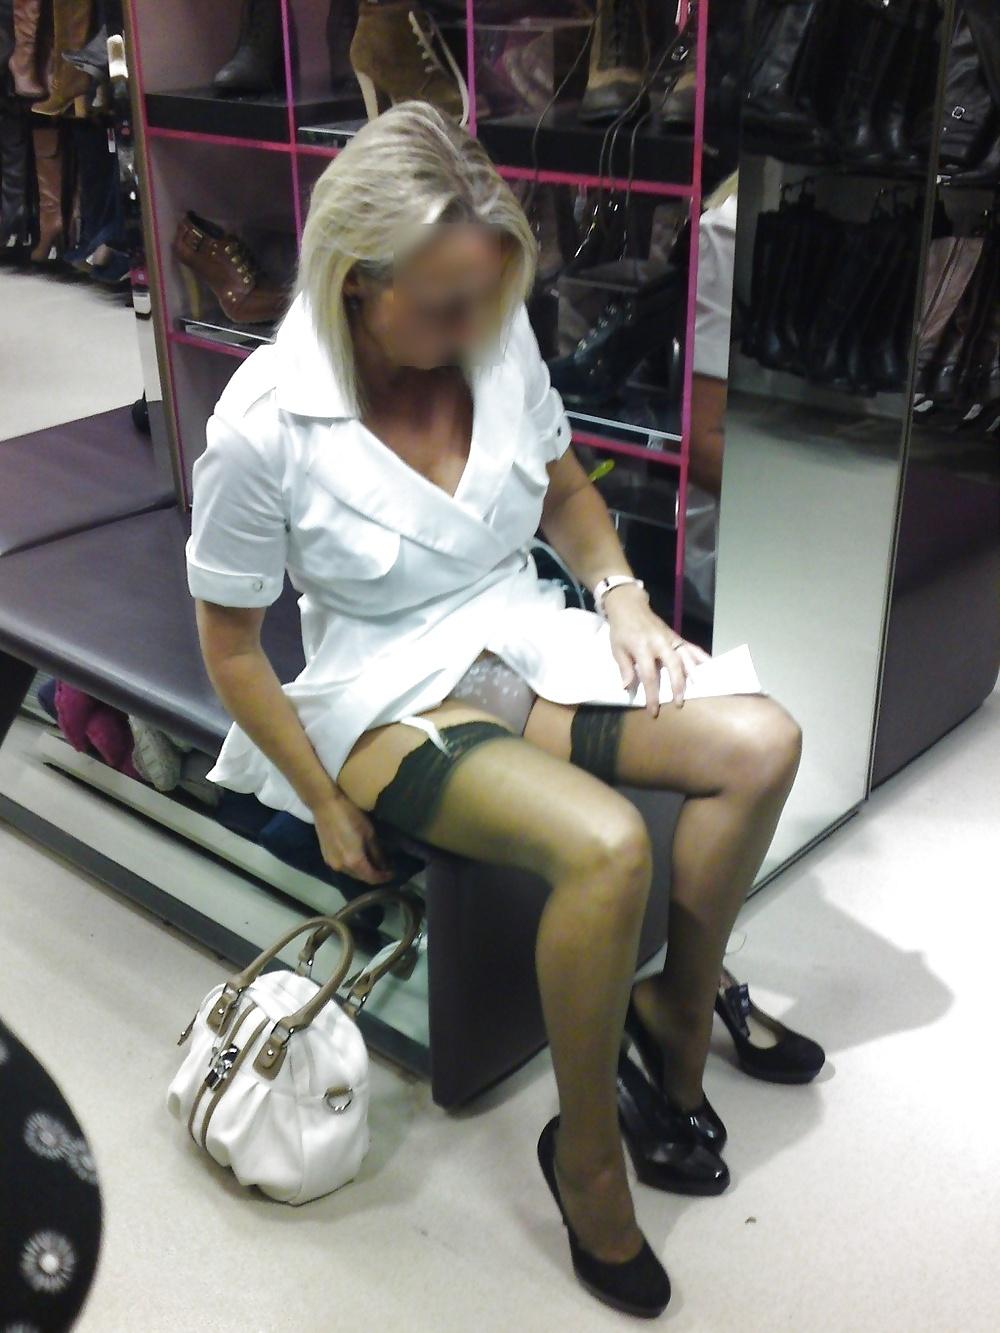 Milf upskirt in shop